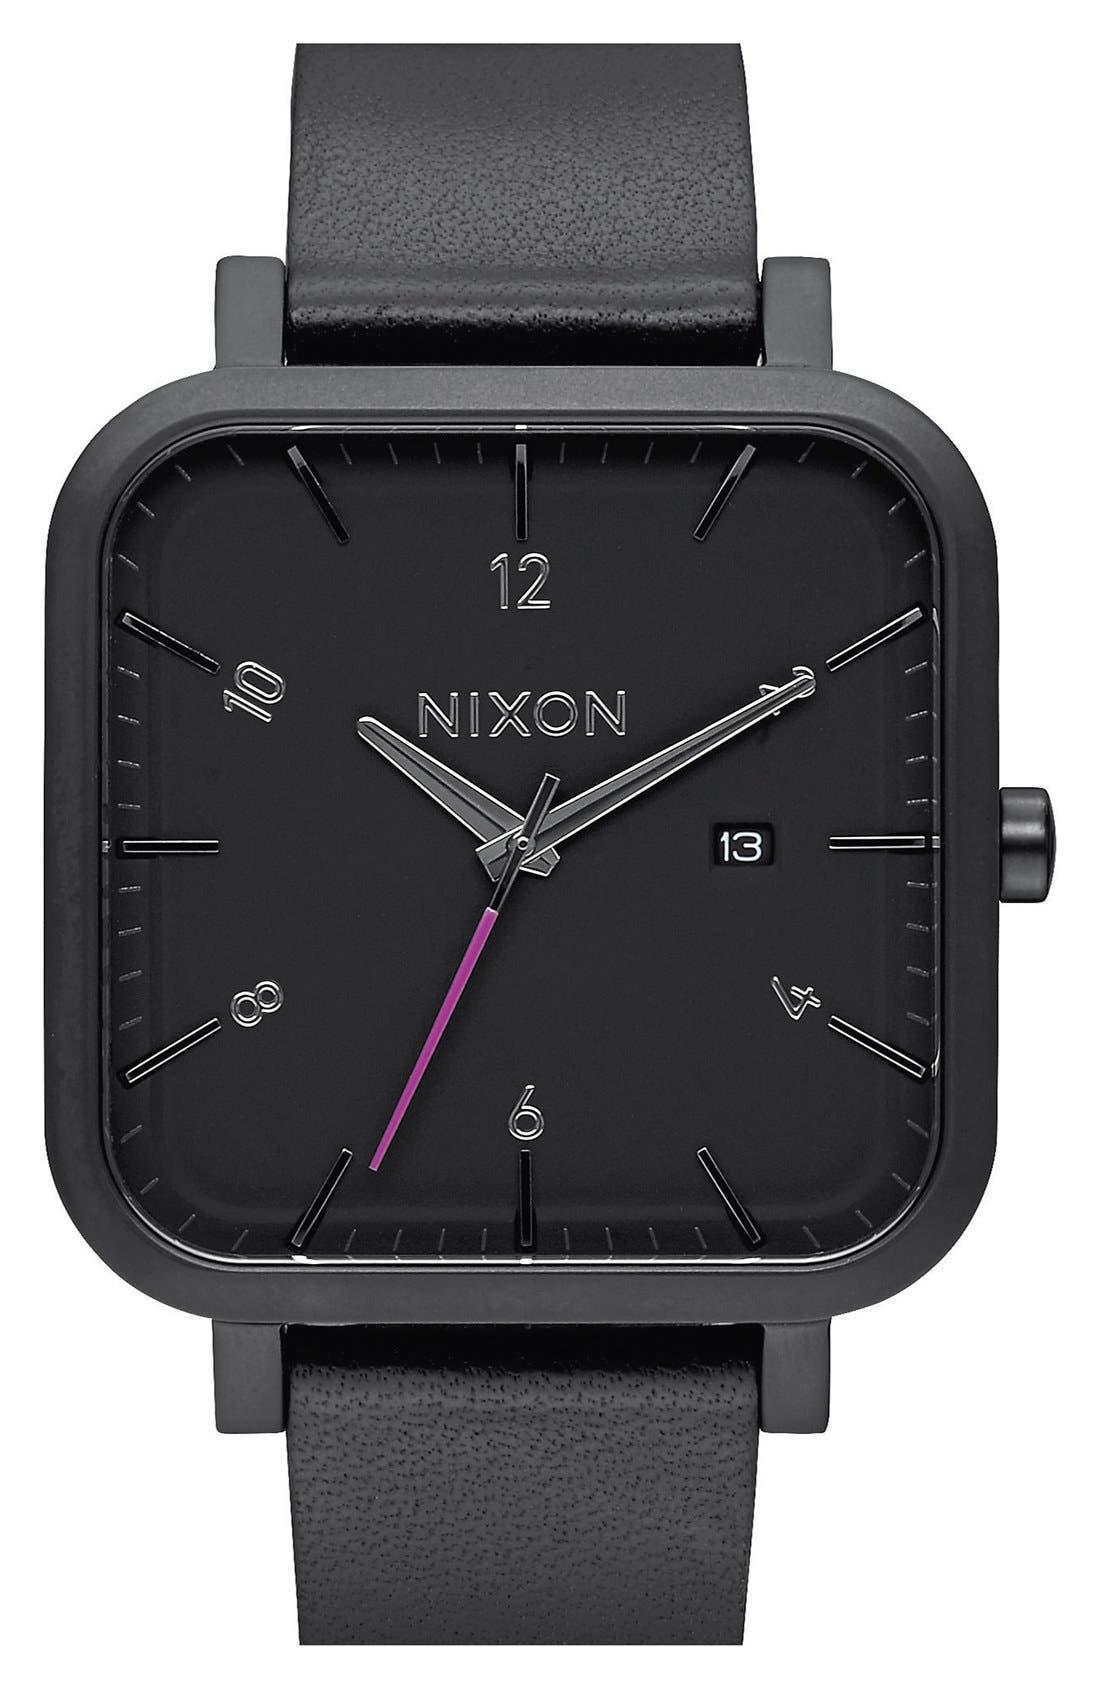 Nixon 'Ragnar' Square Leather Strap Watch, 40mm x 40mm